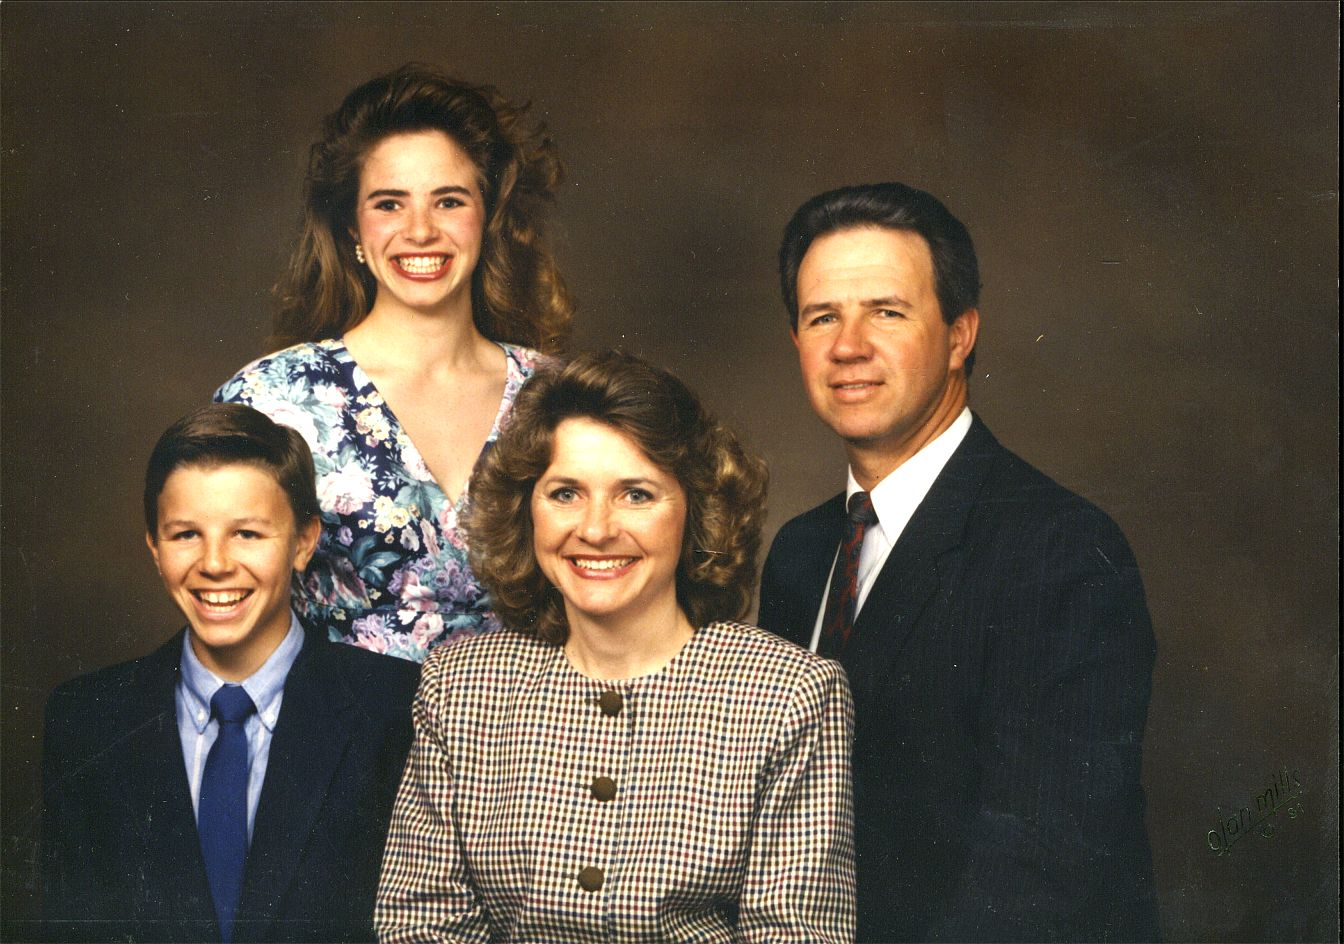 Larry, Valeria, Delynn and Daryl Okonski